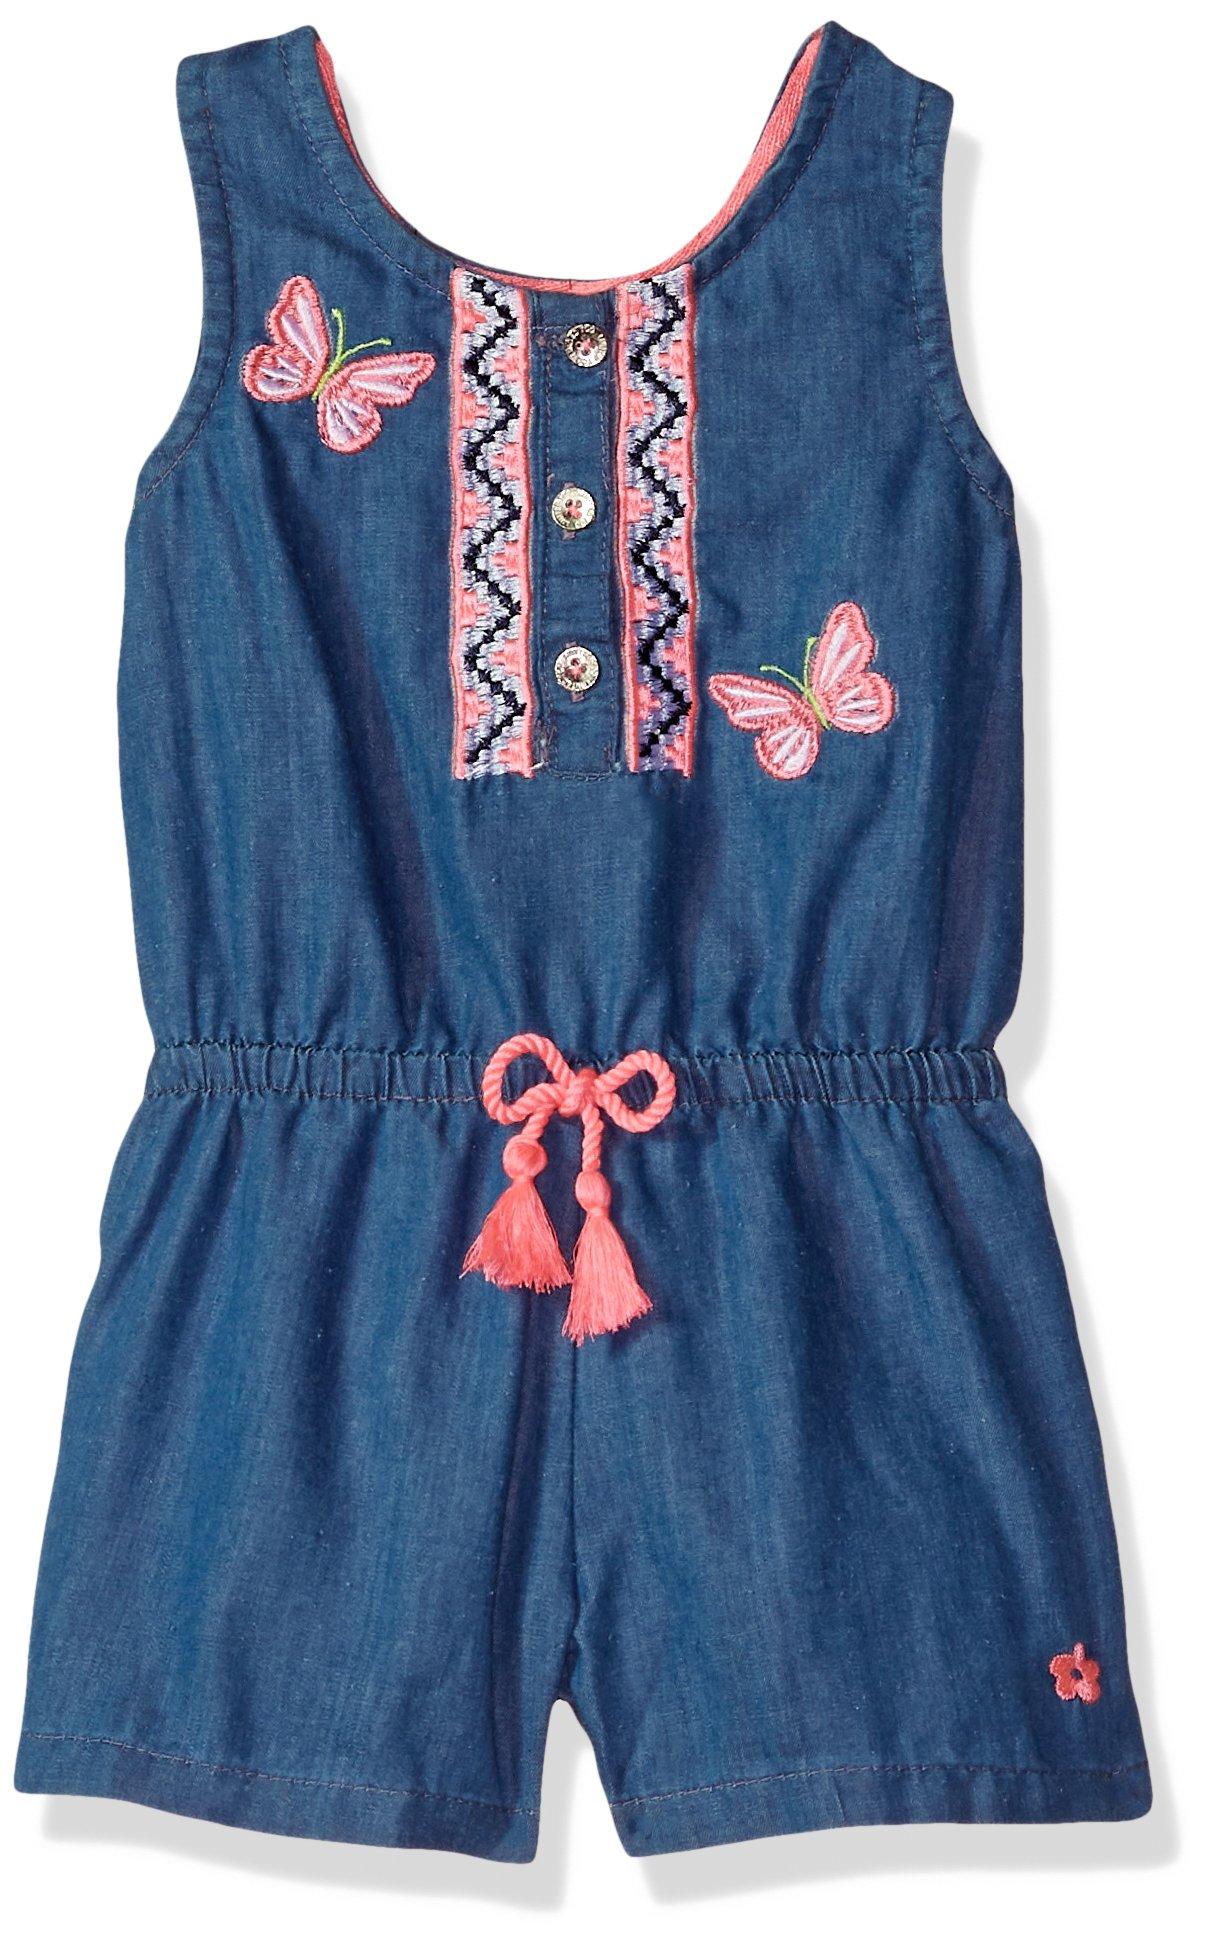 Limited Too Girls' Toddler Romper, Butterflies Medium Blue wash, 2T